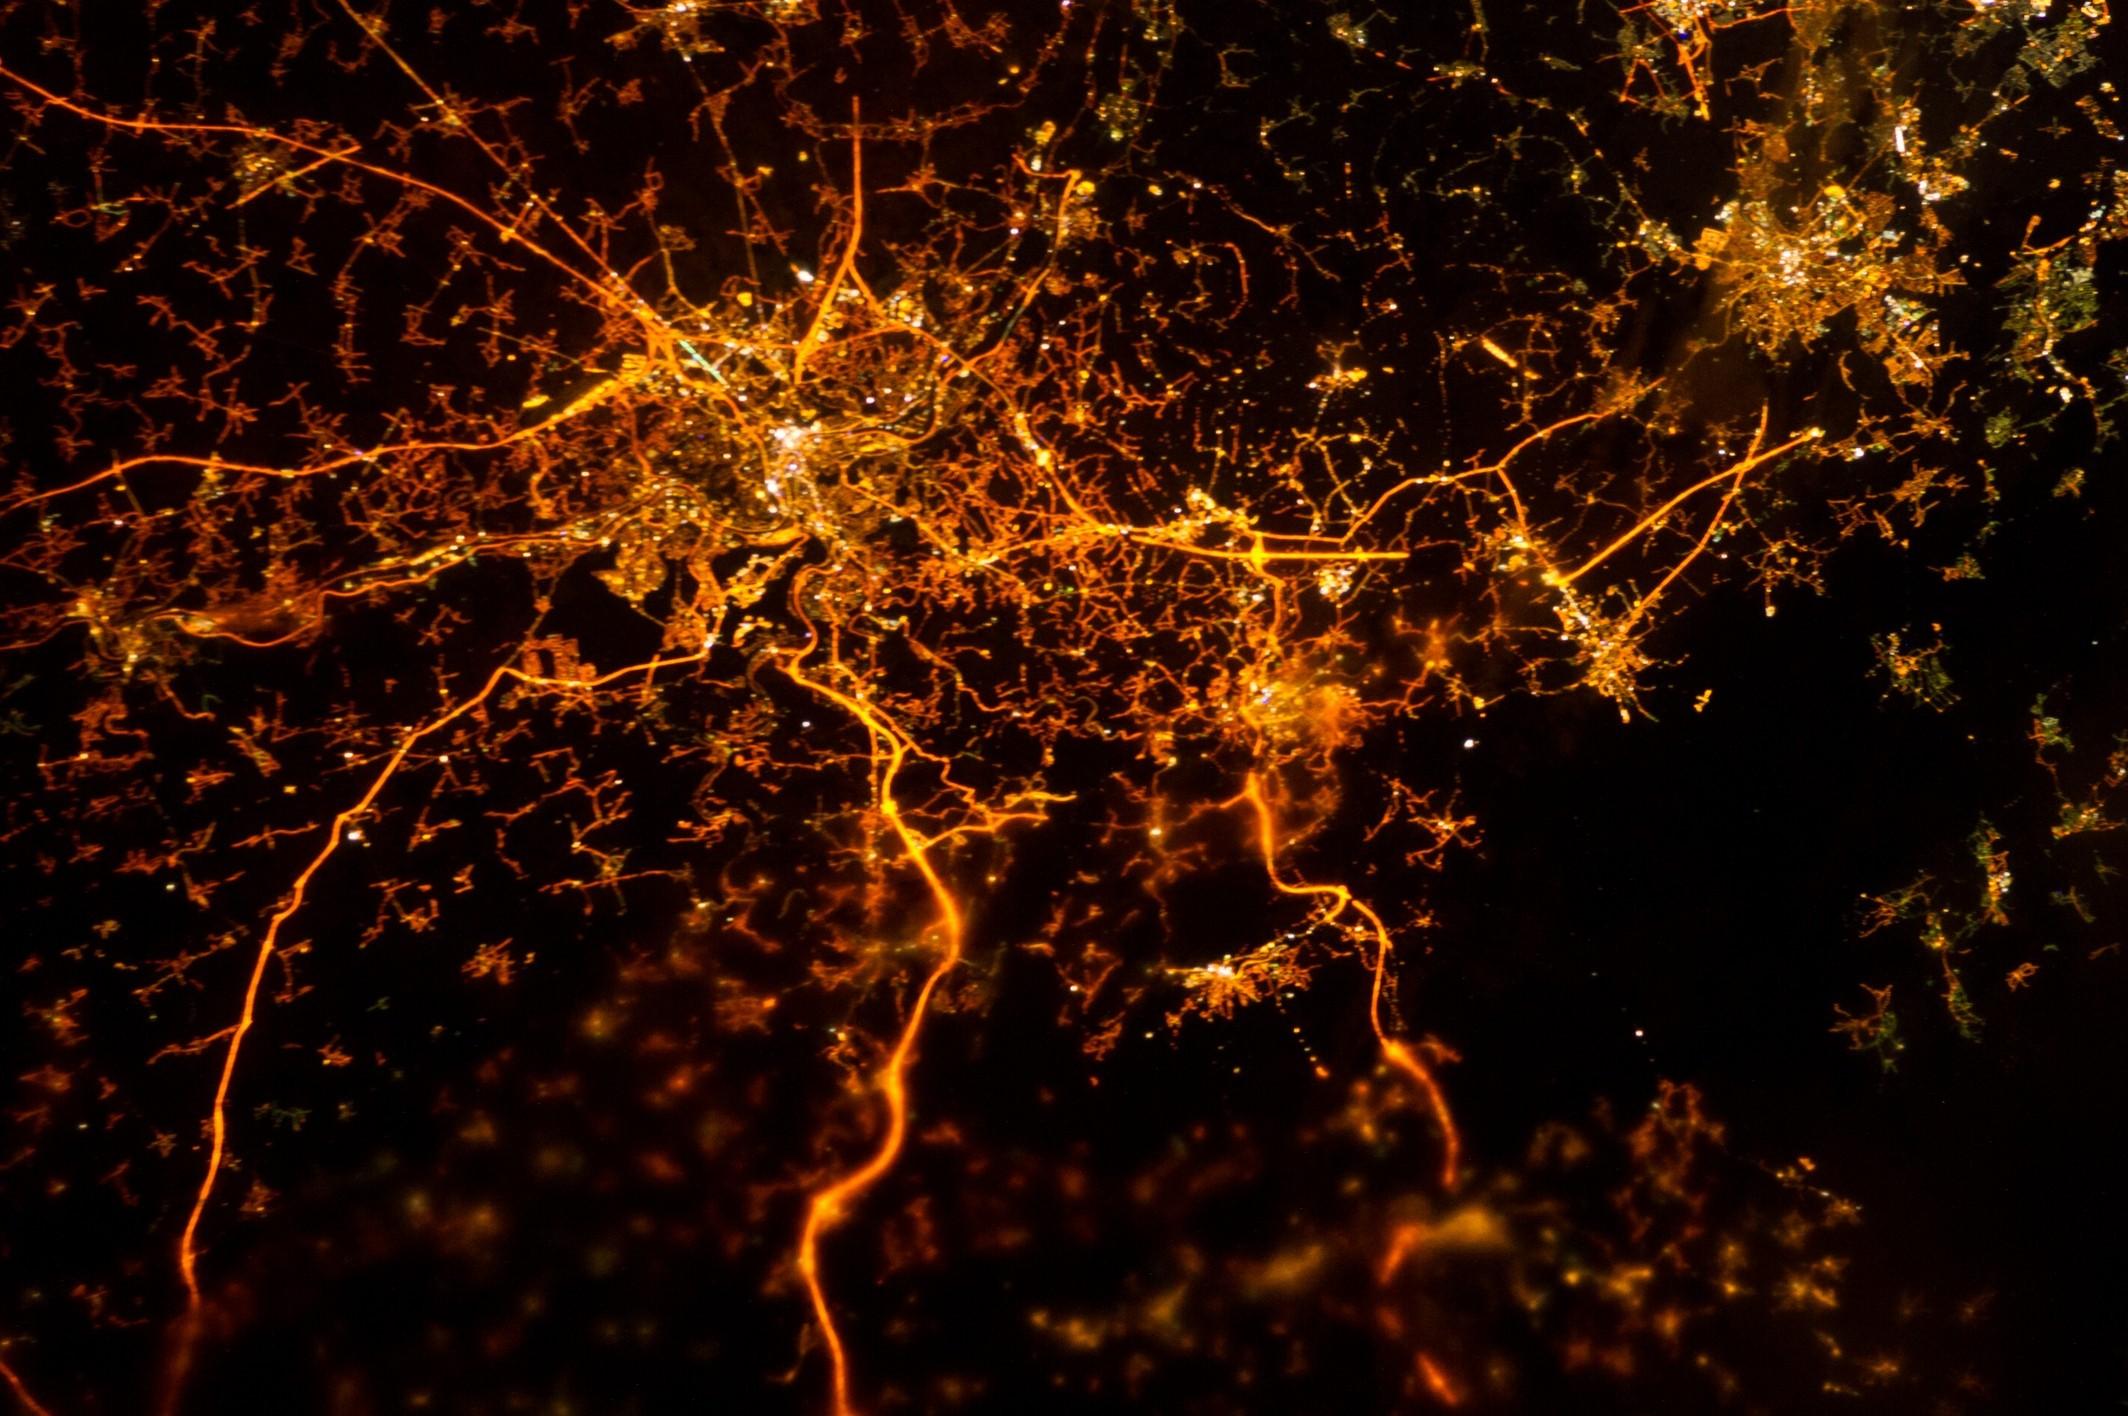 space in images 2013 12 li232ge belgium